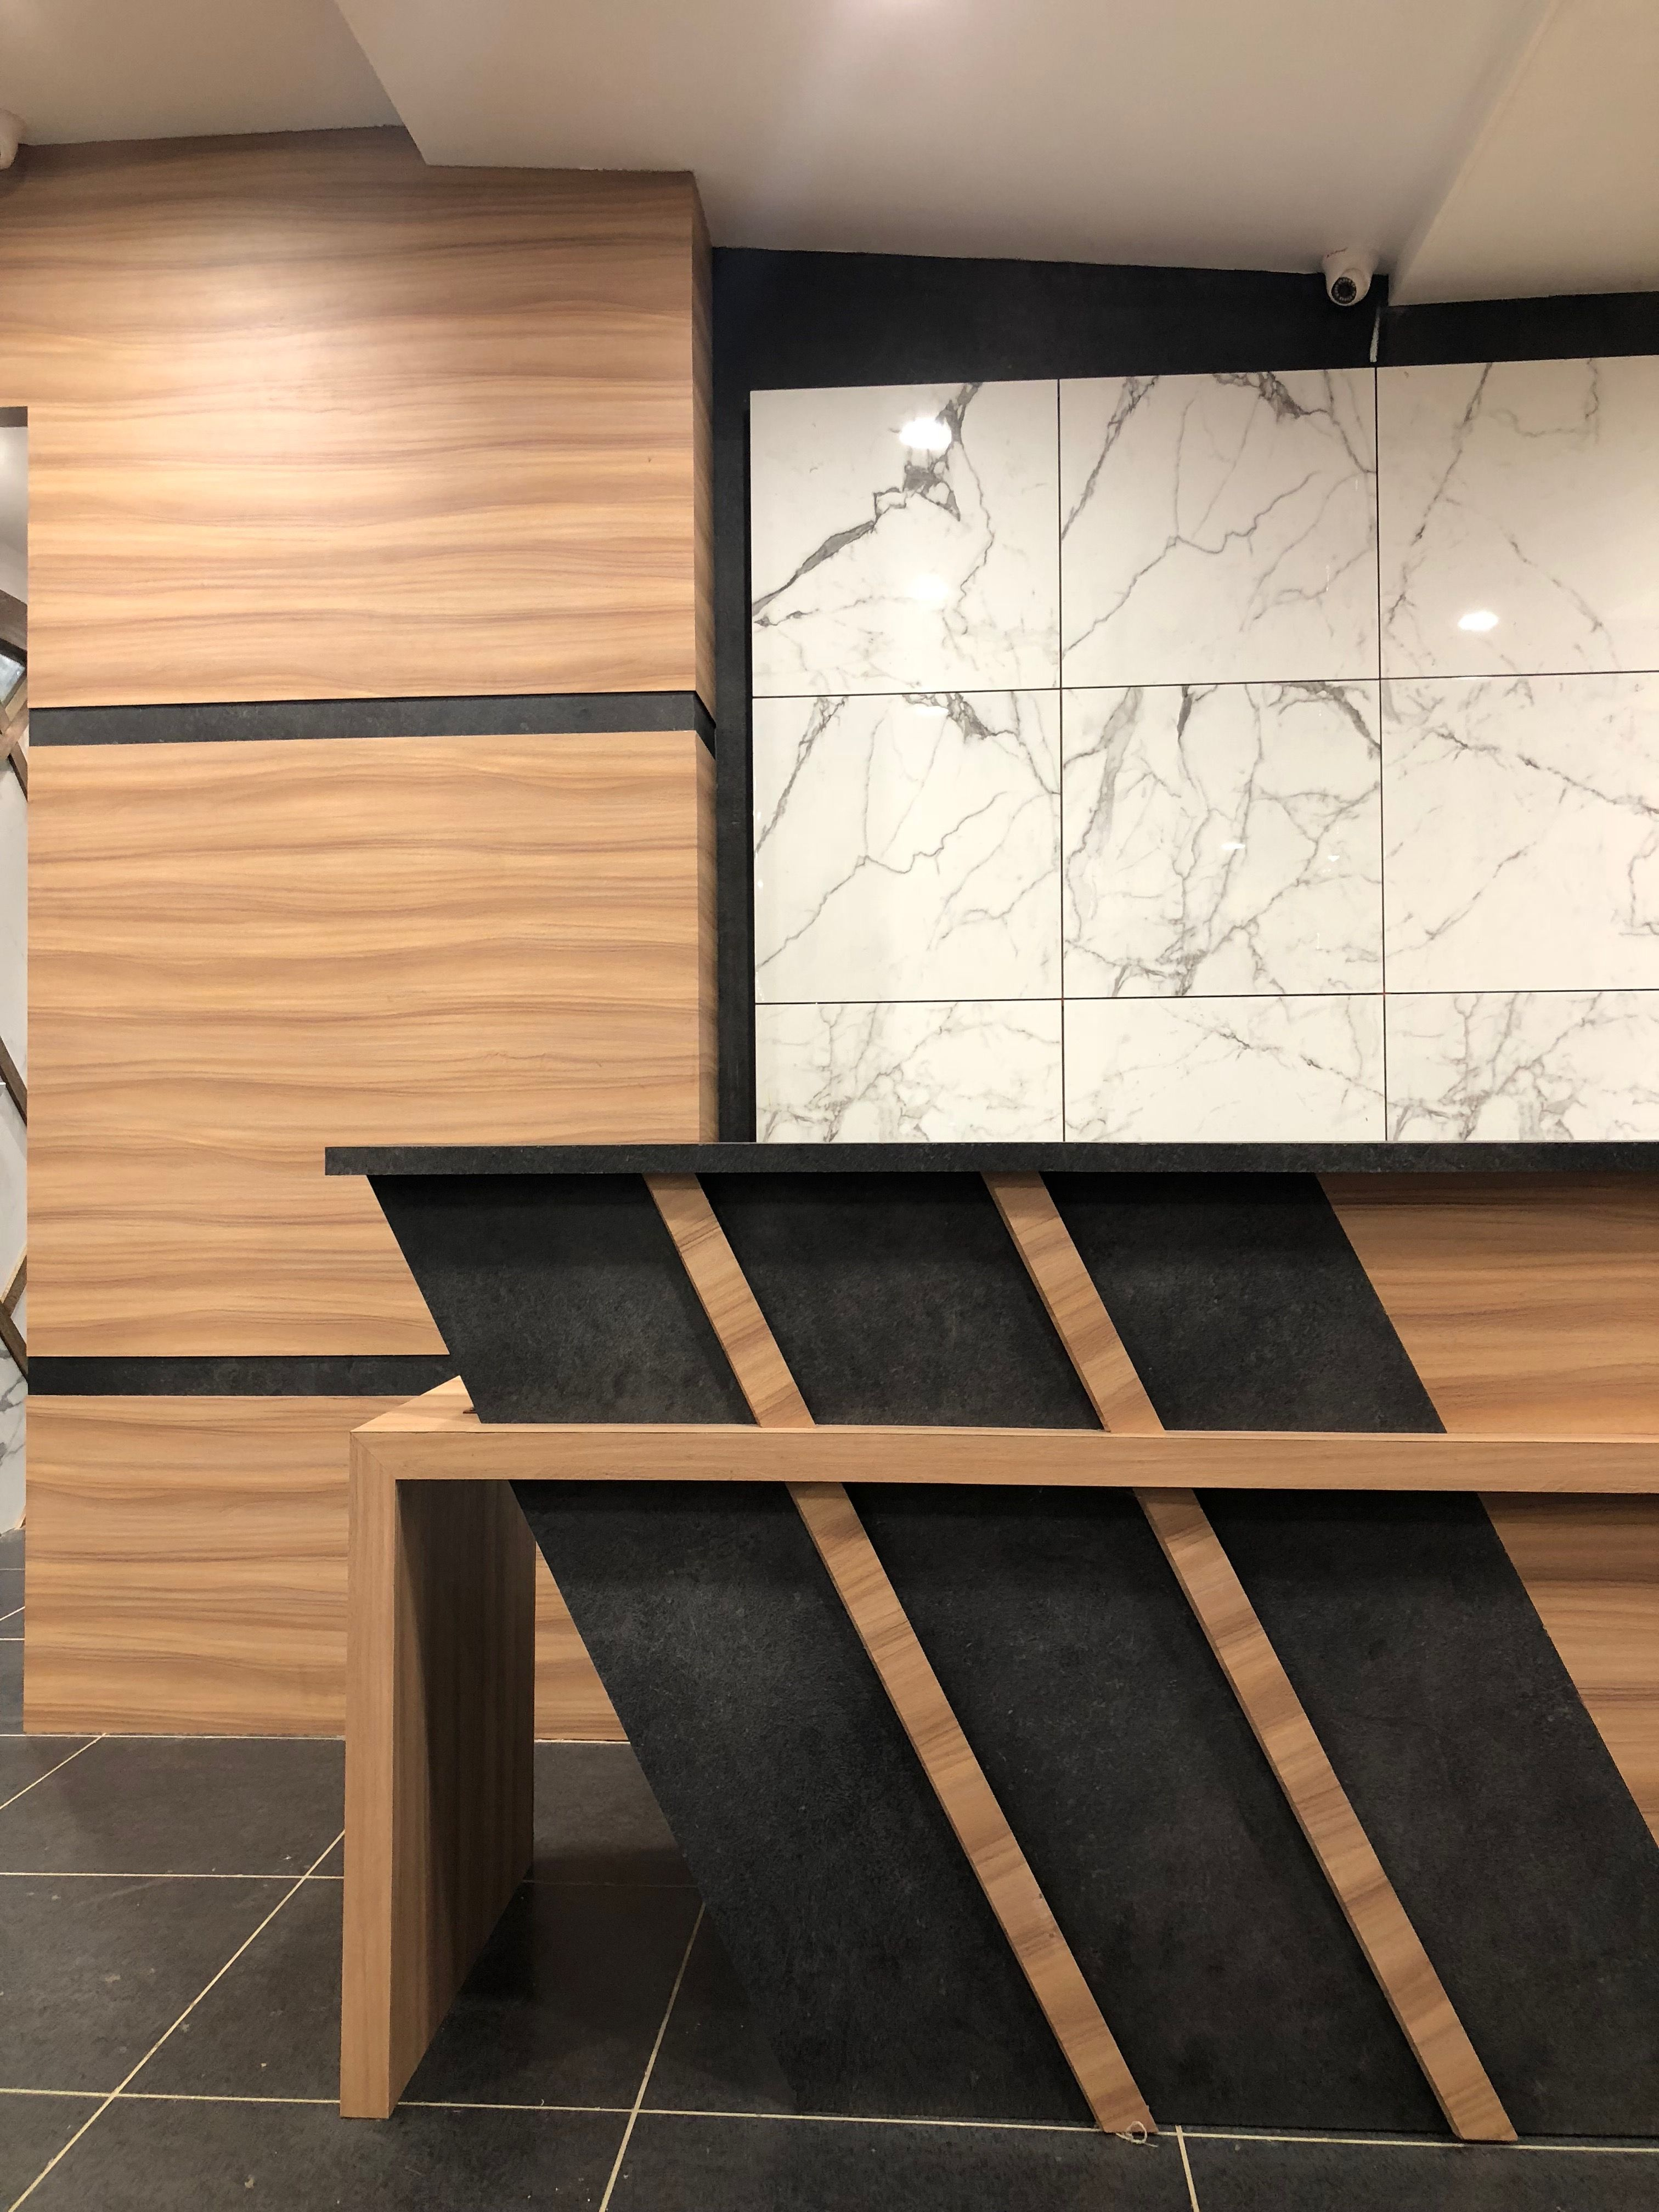 Reception#table#porcelain#tiles#woodenfinish#pattern#modern